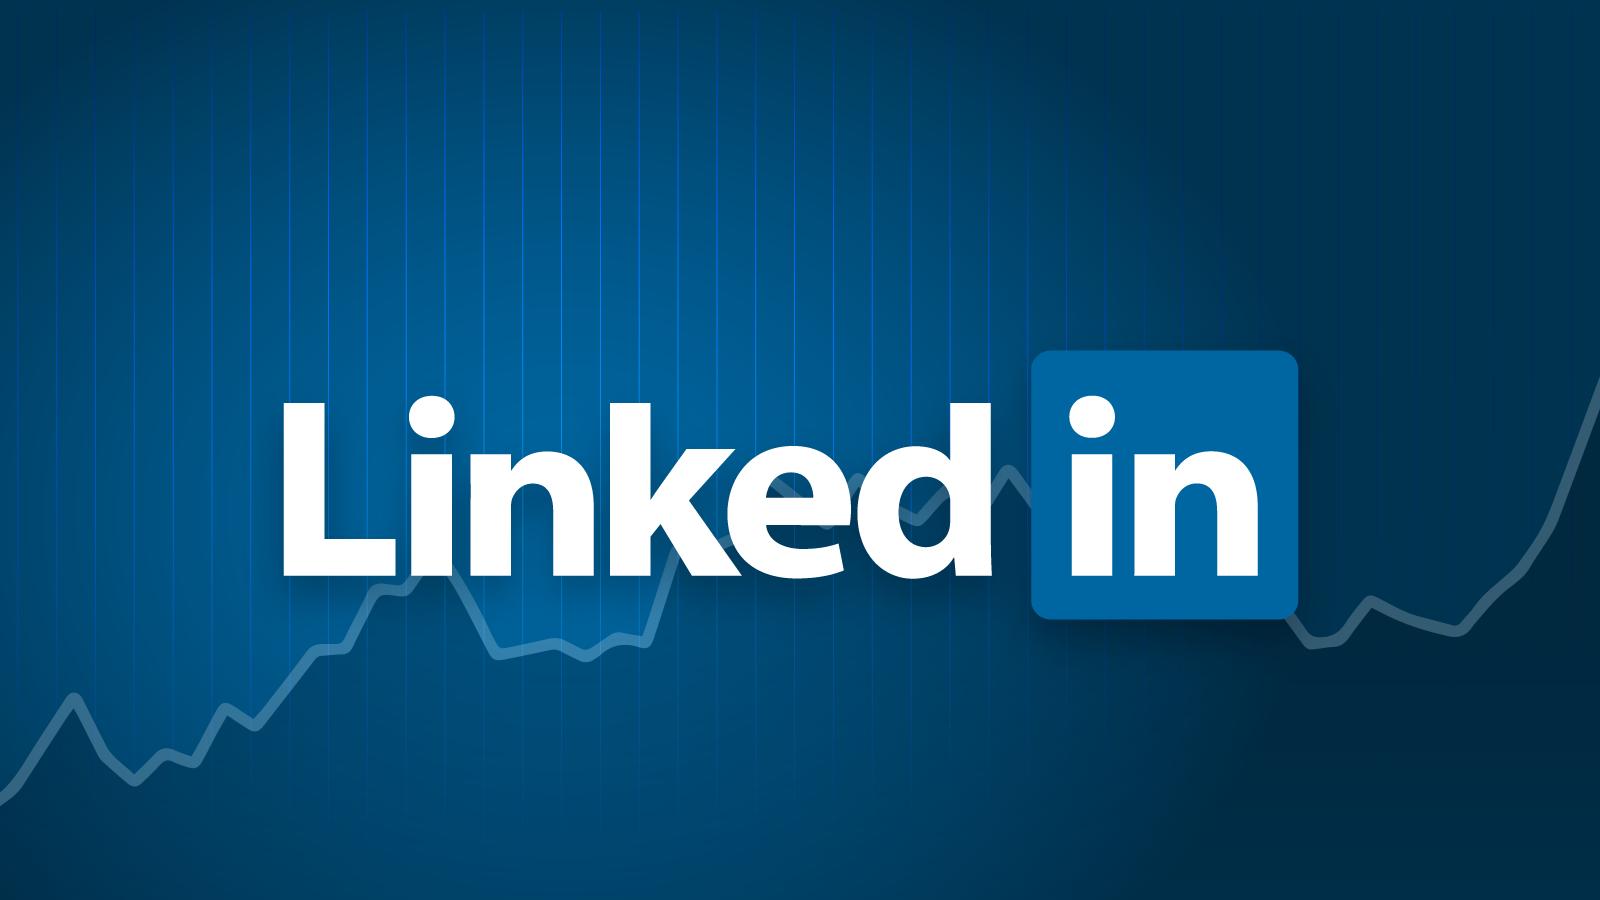 LinkedIn for companies